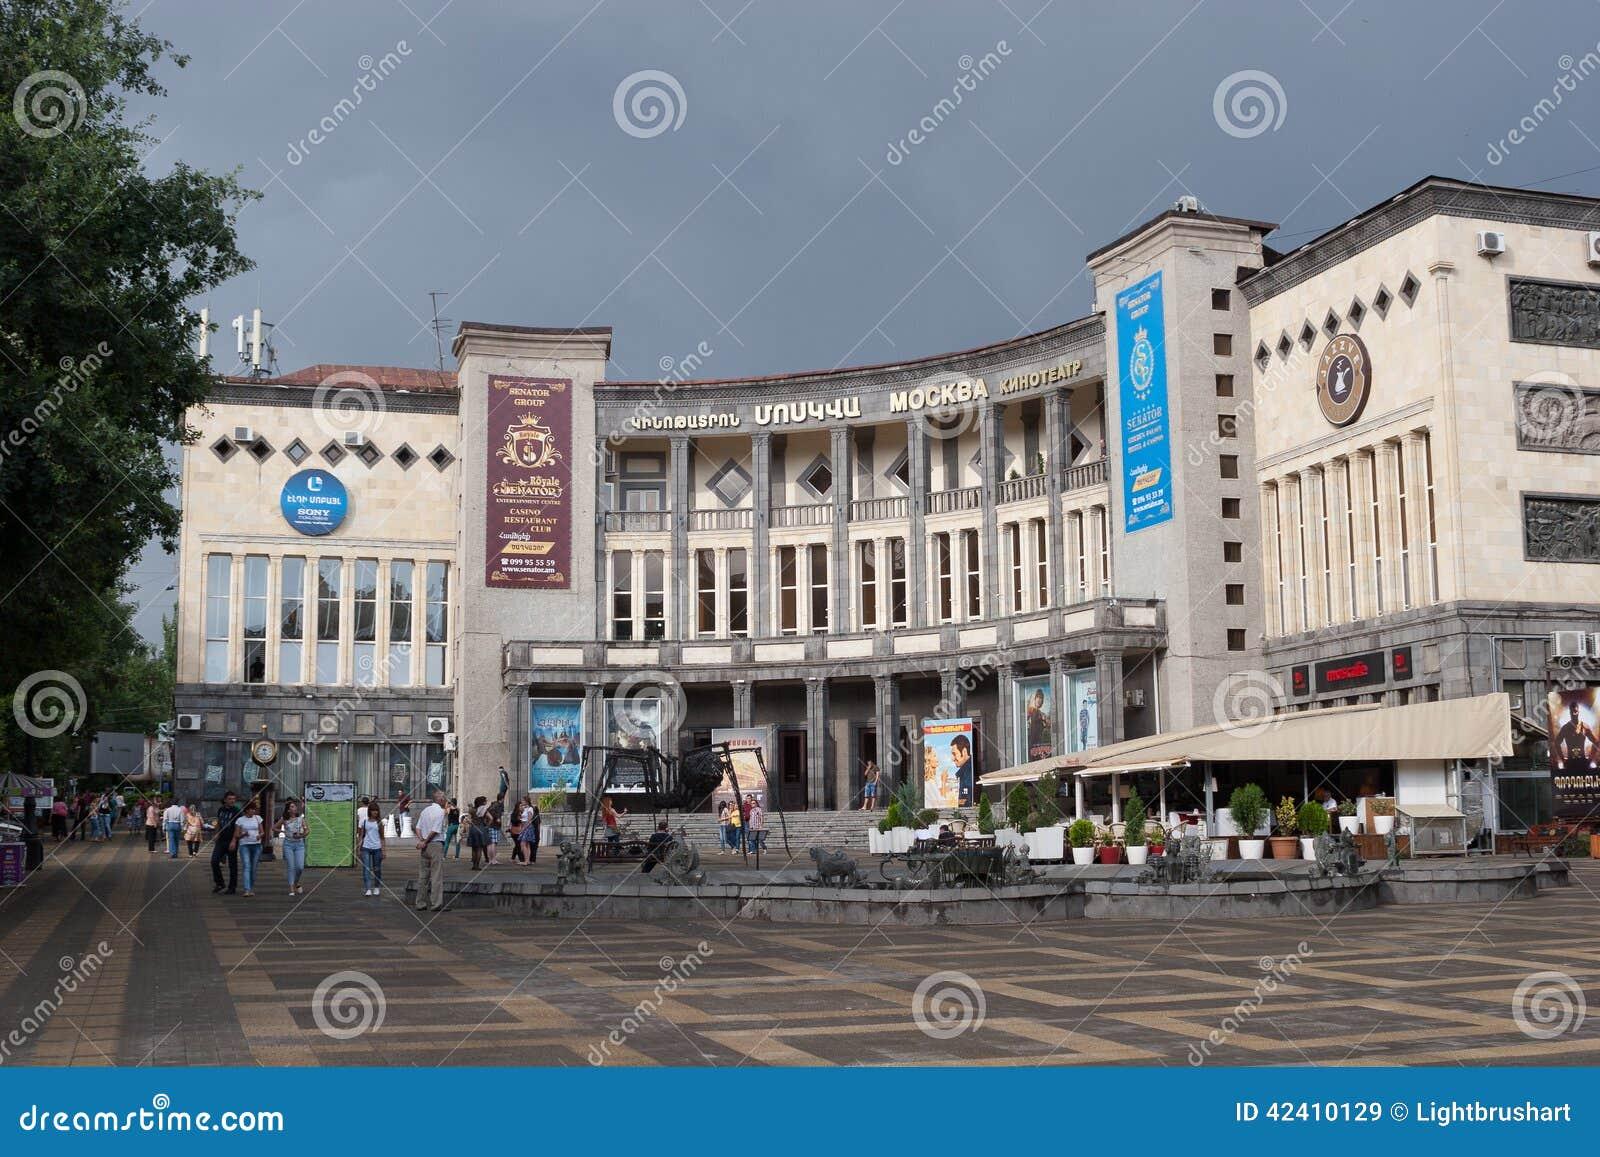 moscow cinema  yerevan  armenia editorial stock image